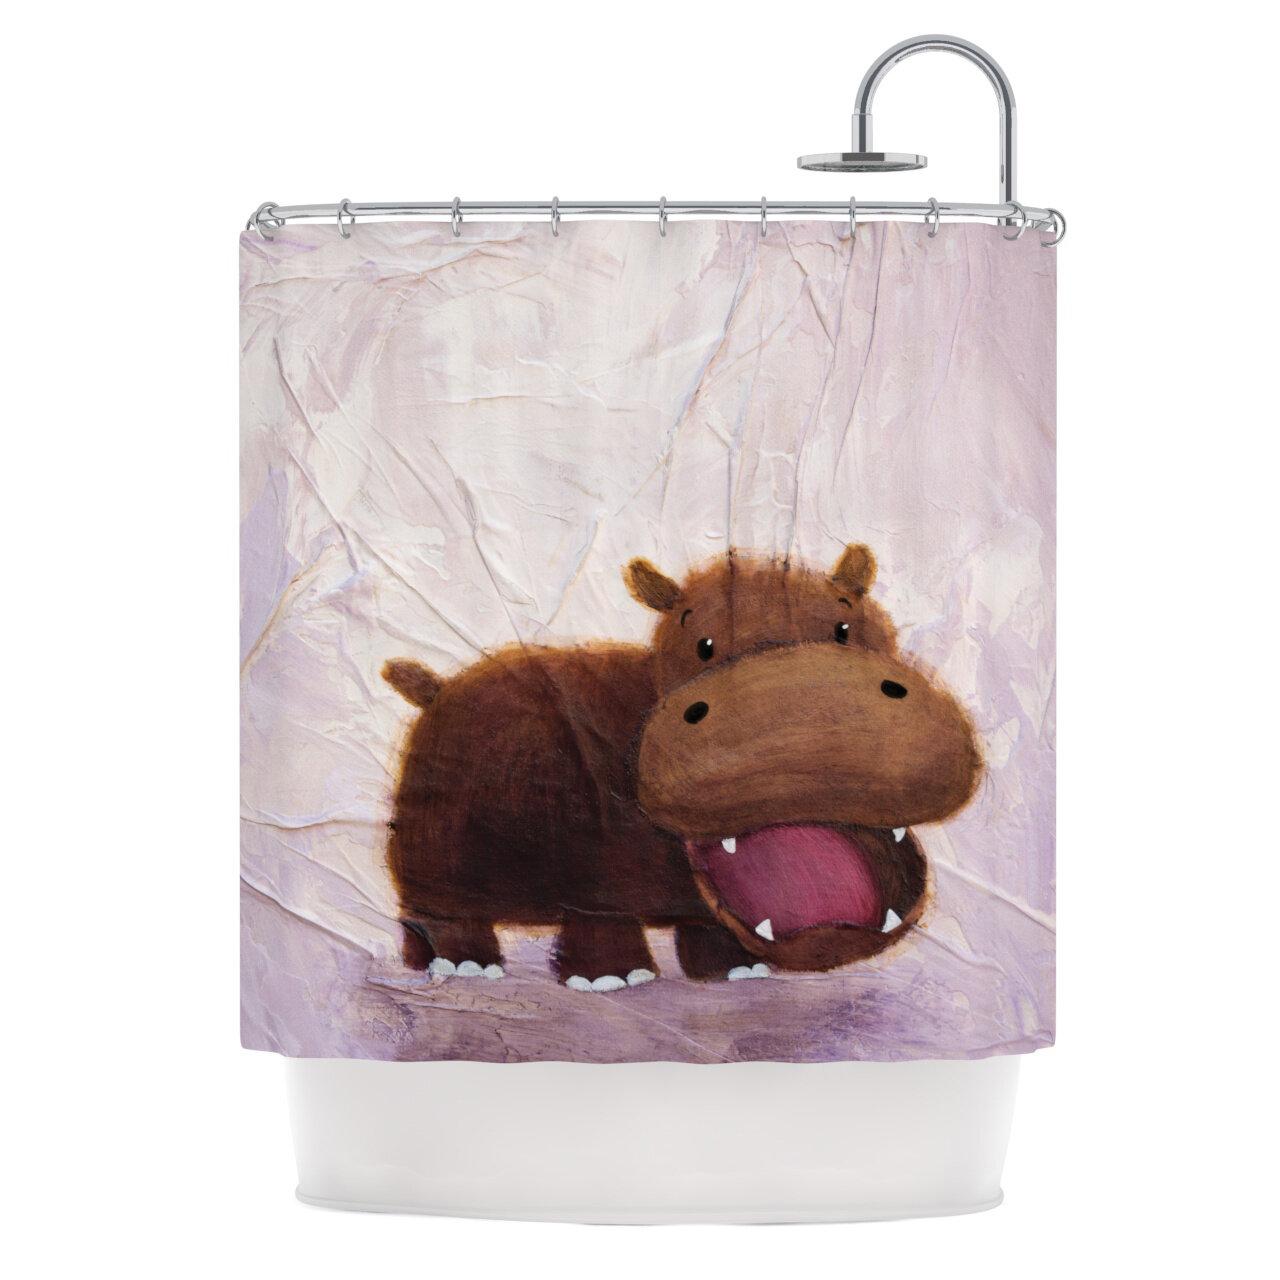 KESS InHouse The Happy Hippo Shower Curtain